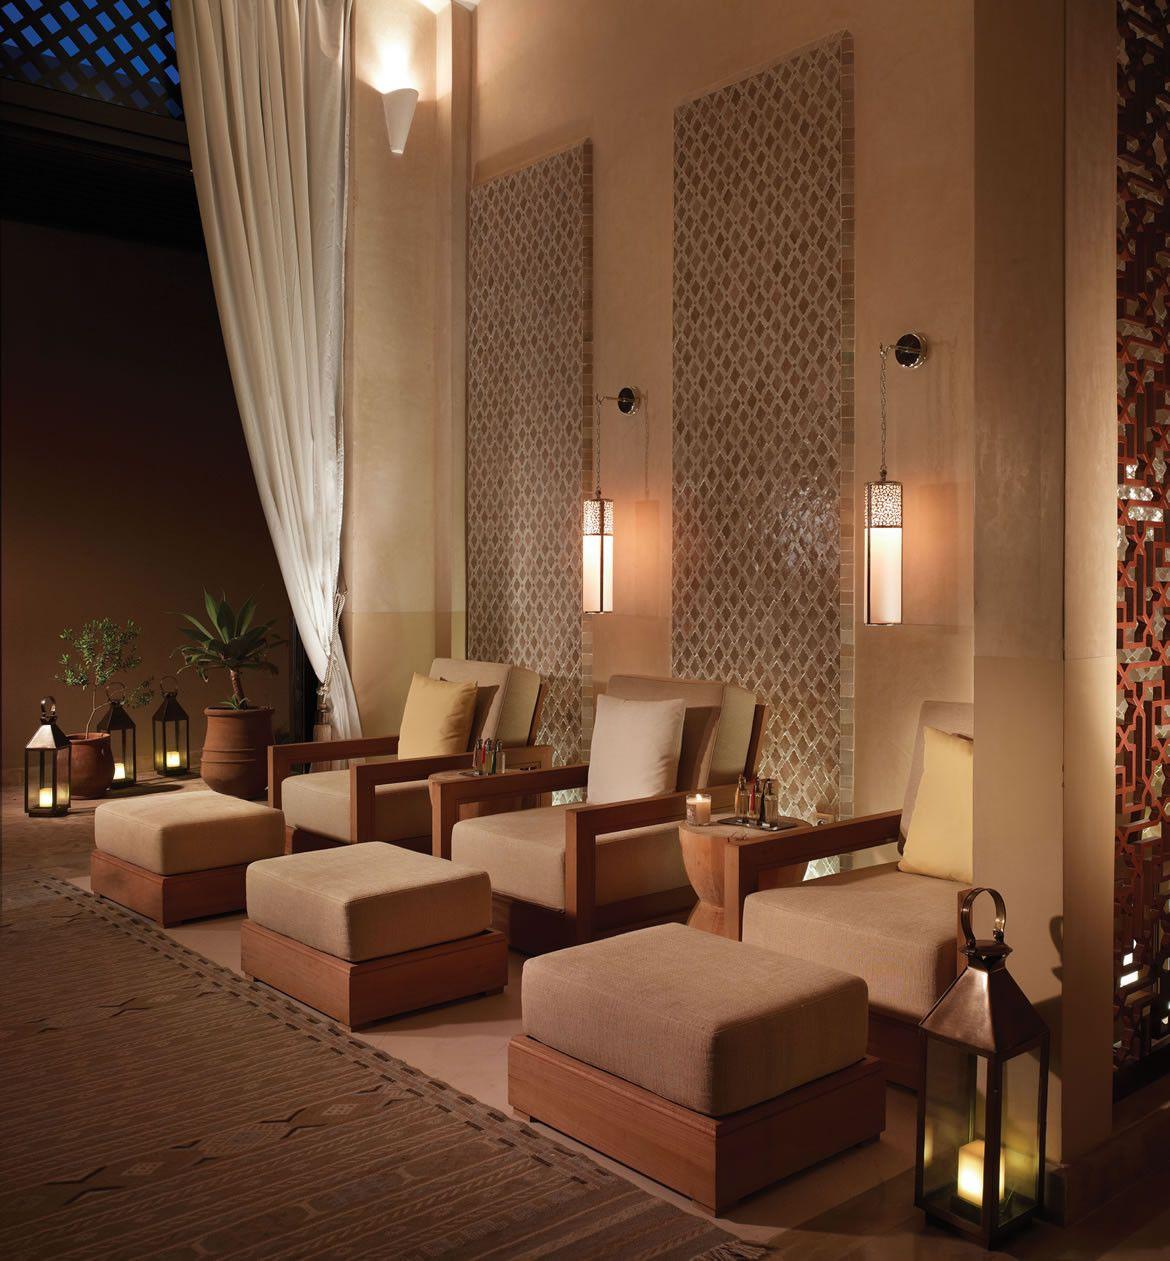 Image result for waldorf astoria new york spa Spa room